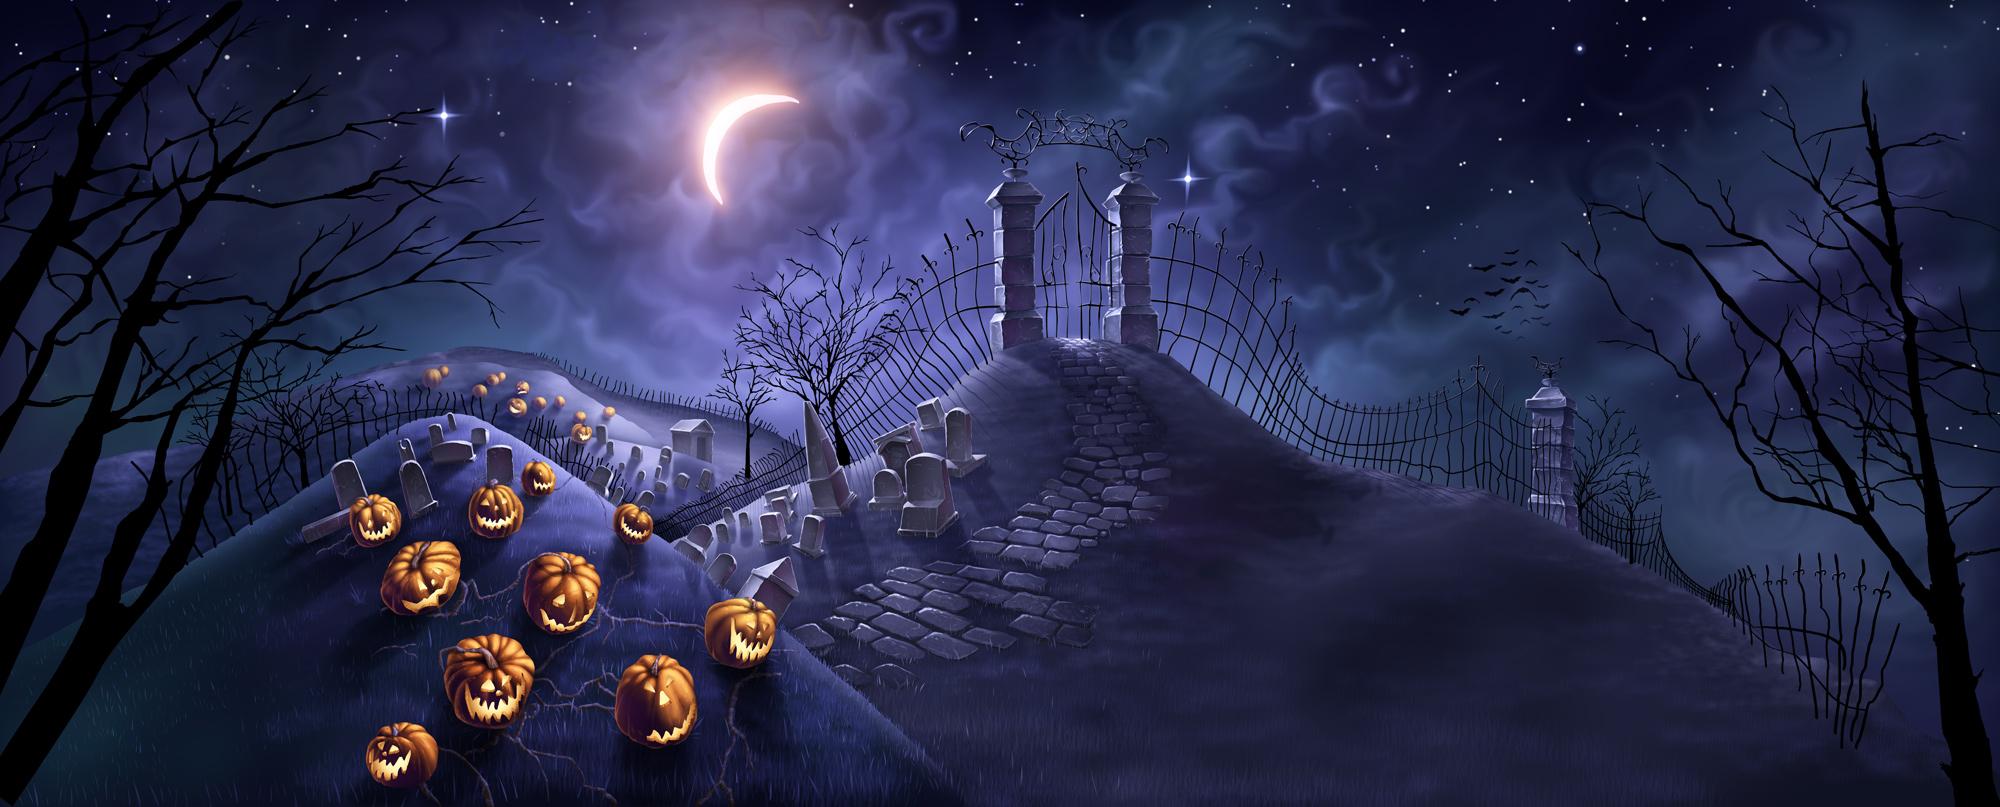 Halloween 2013 Backgrounds amp Wallpapers 2000x807